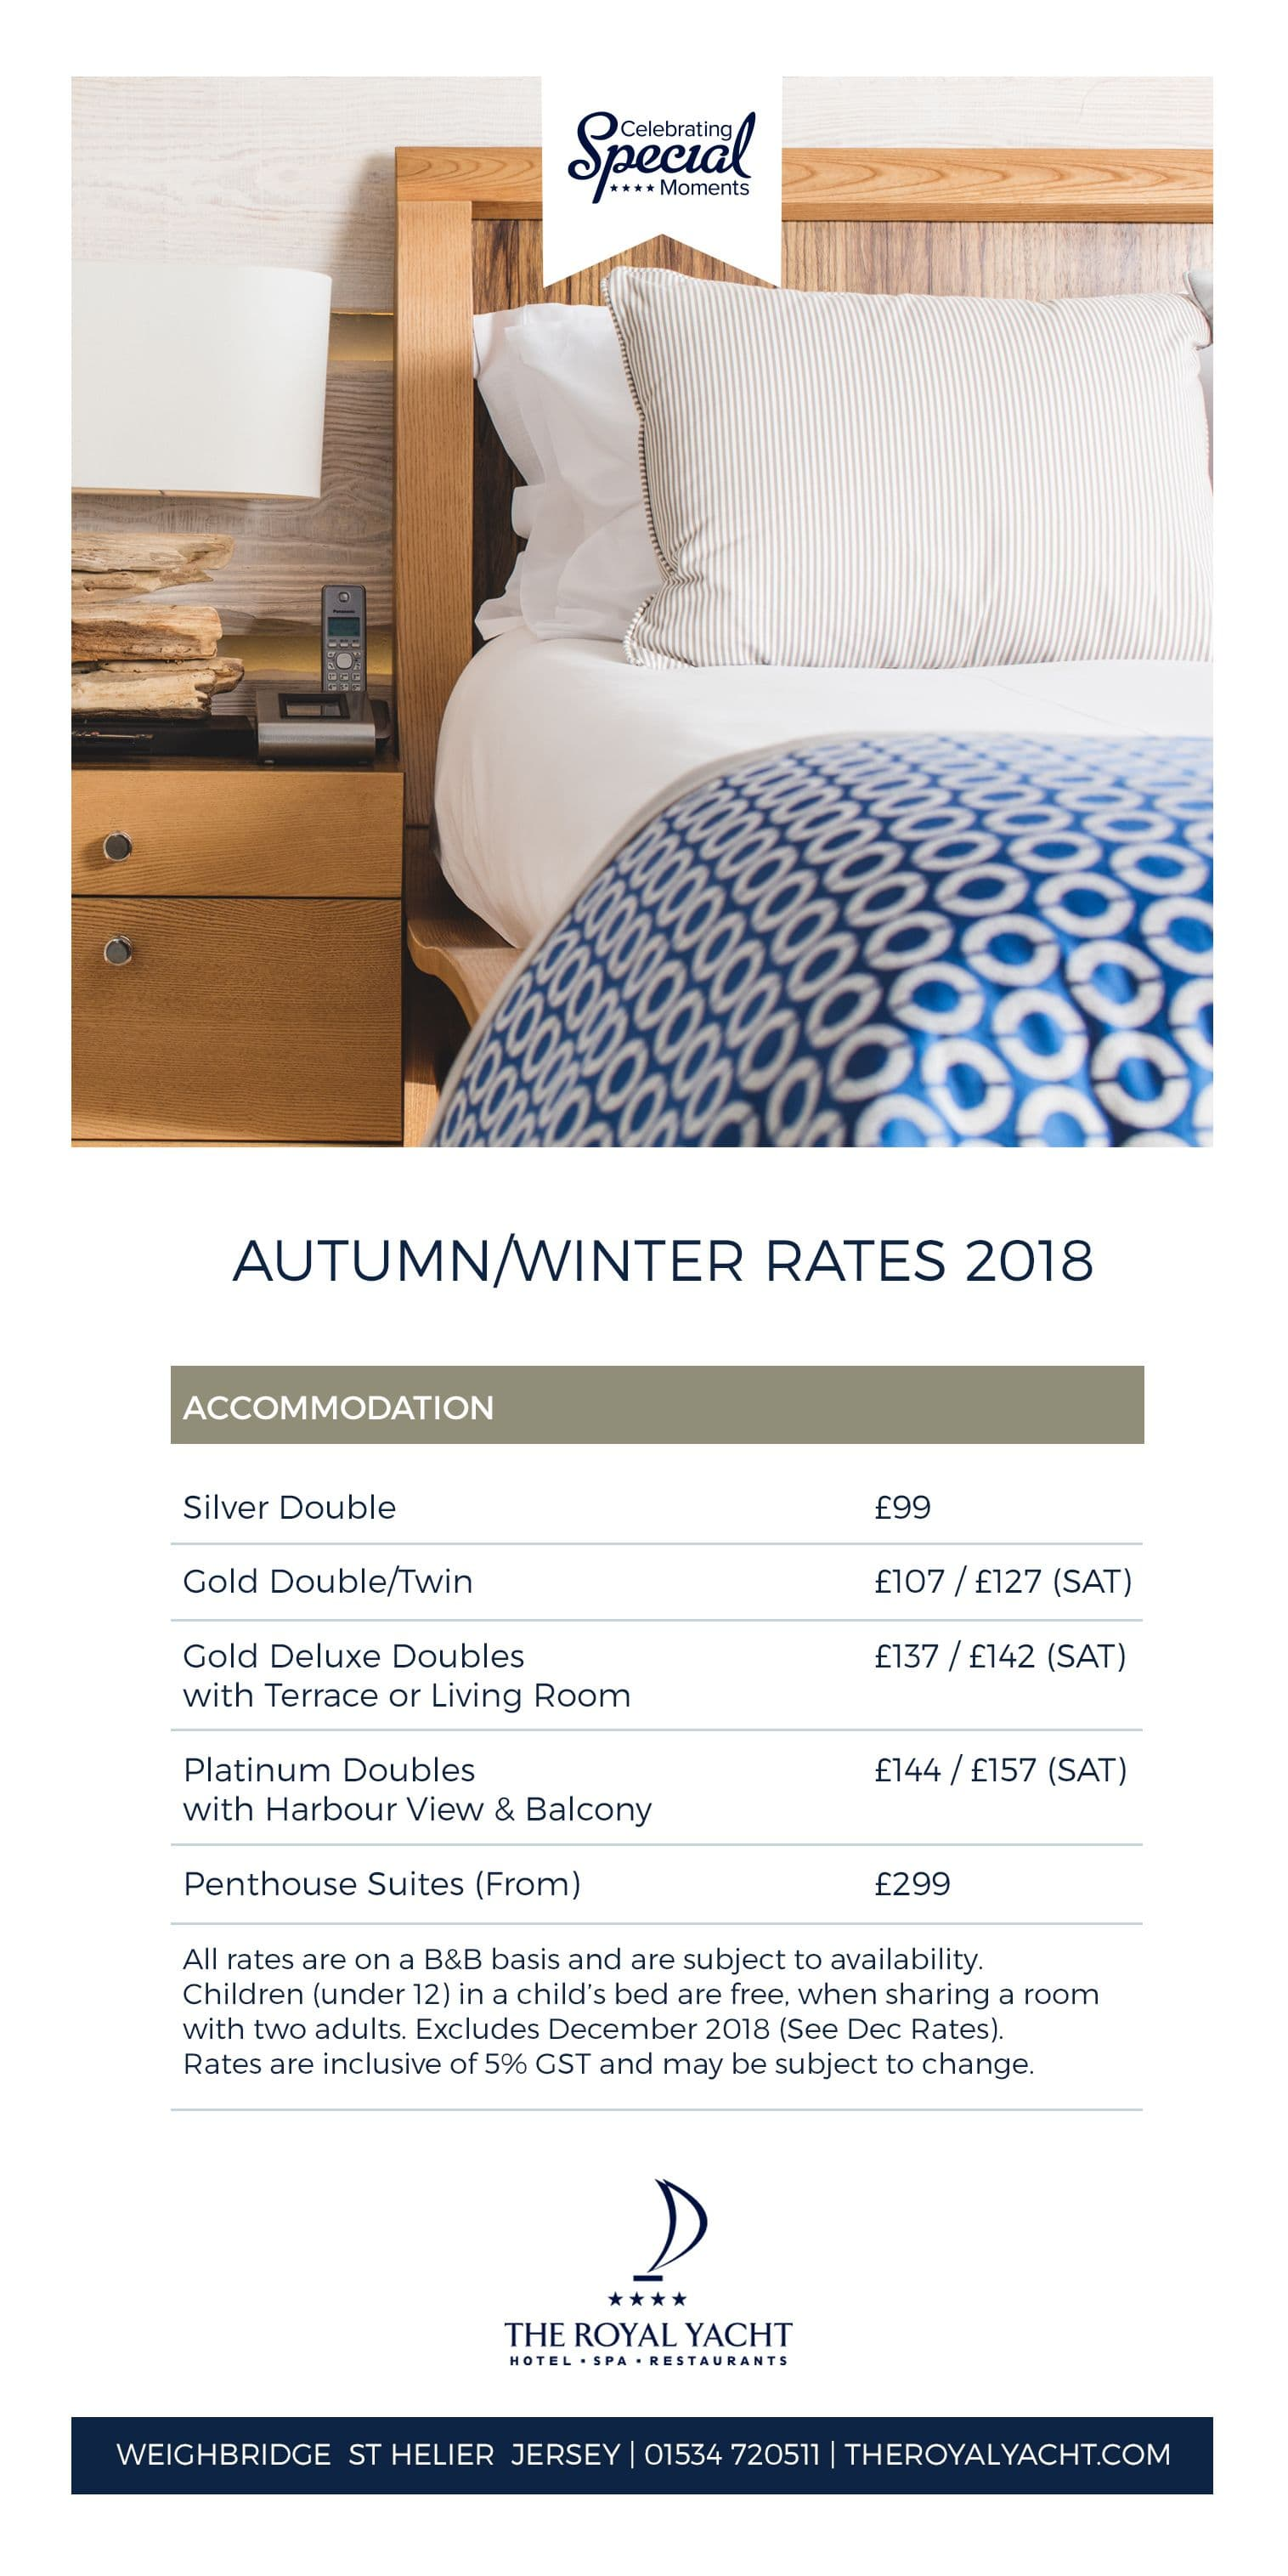 Autumn Rates 2018